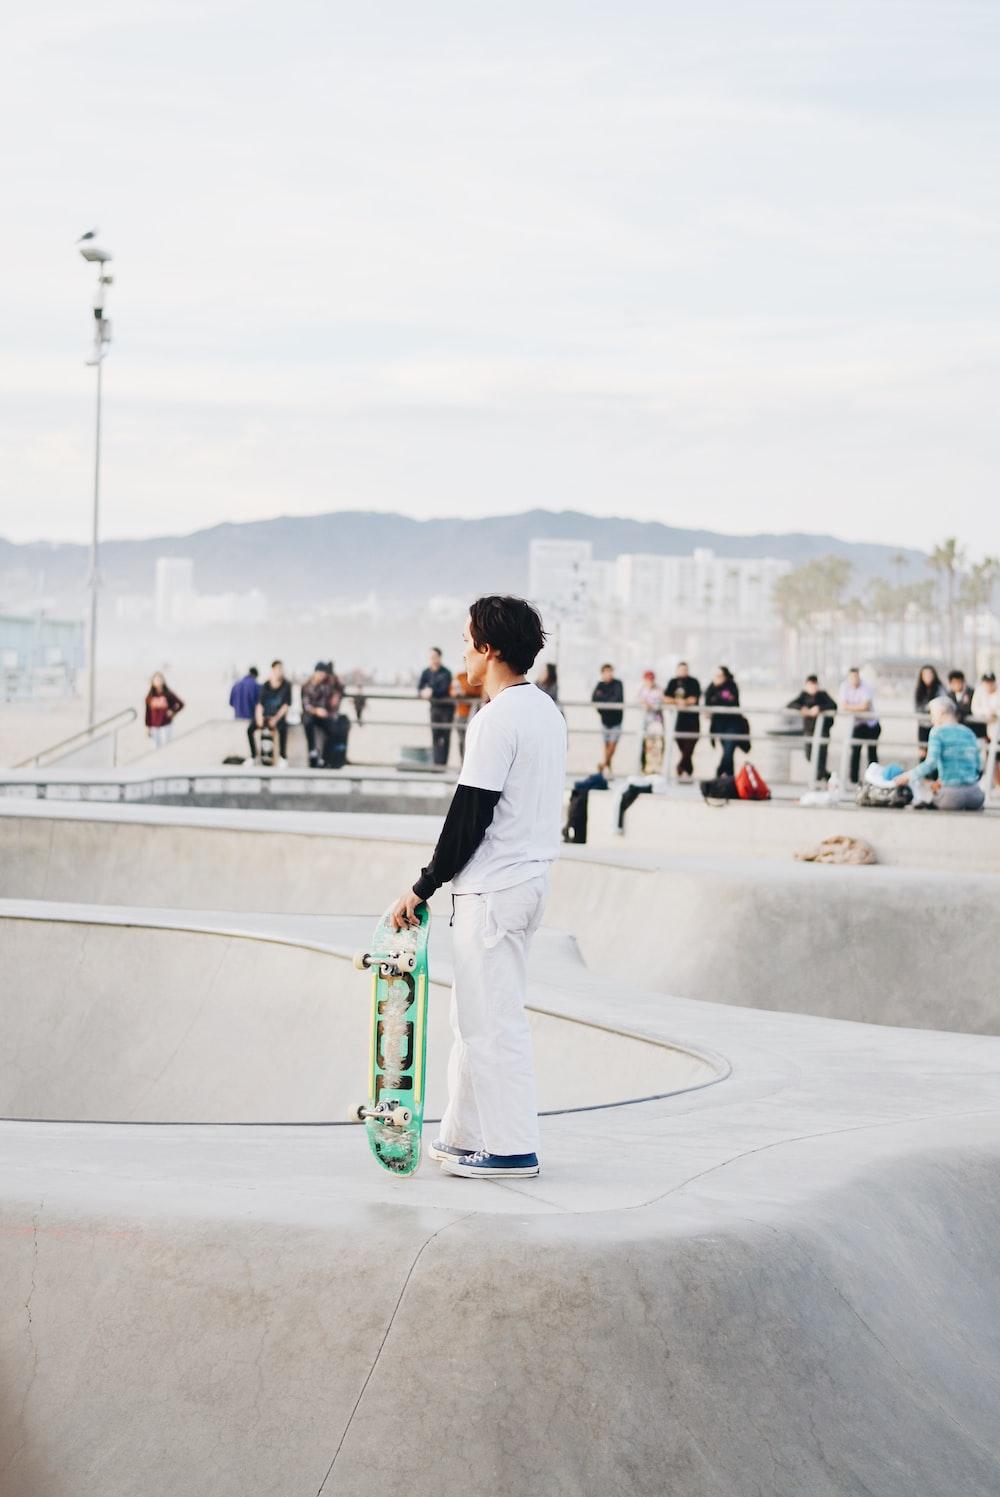 man in white dress shirt and green pants sitting on green skateboard during daytime